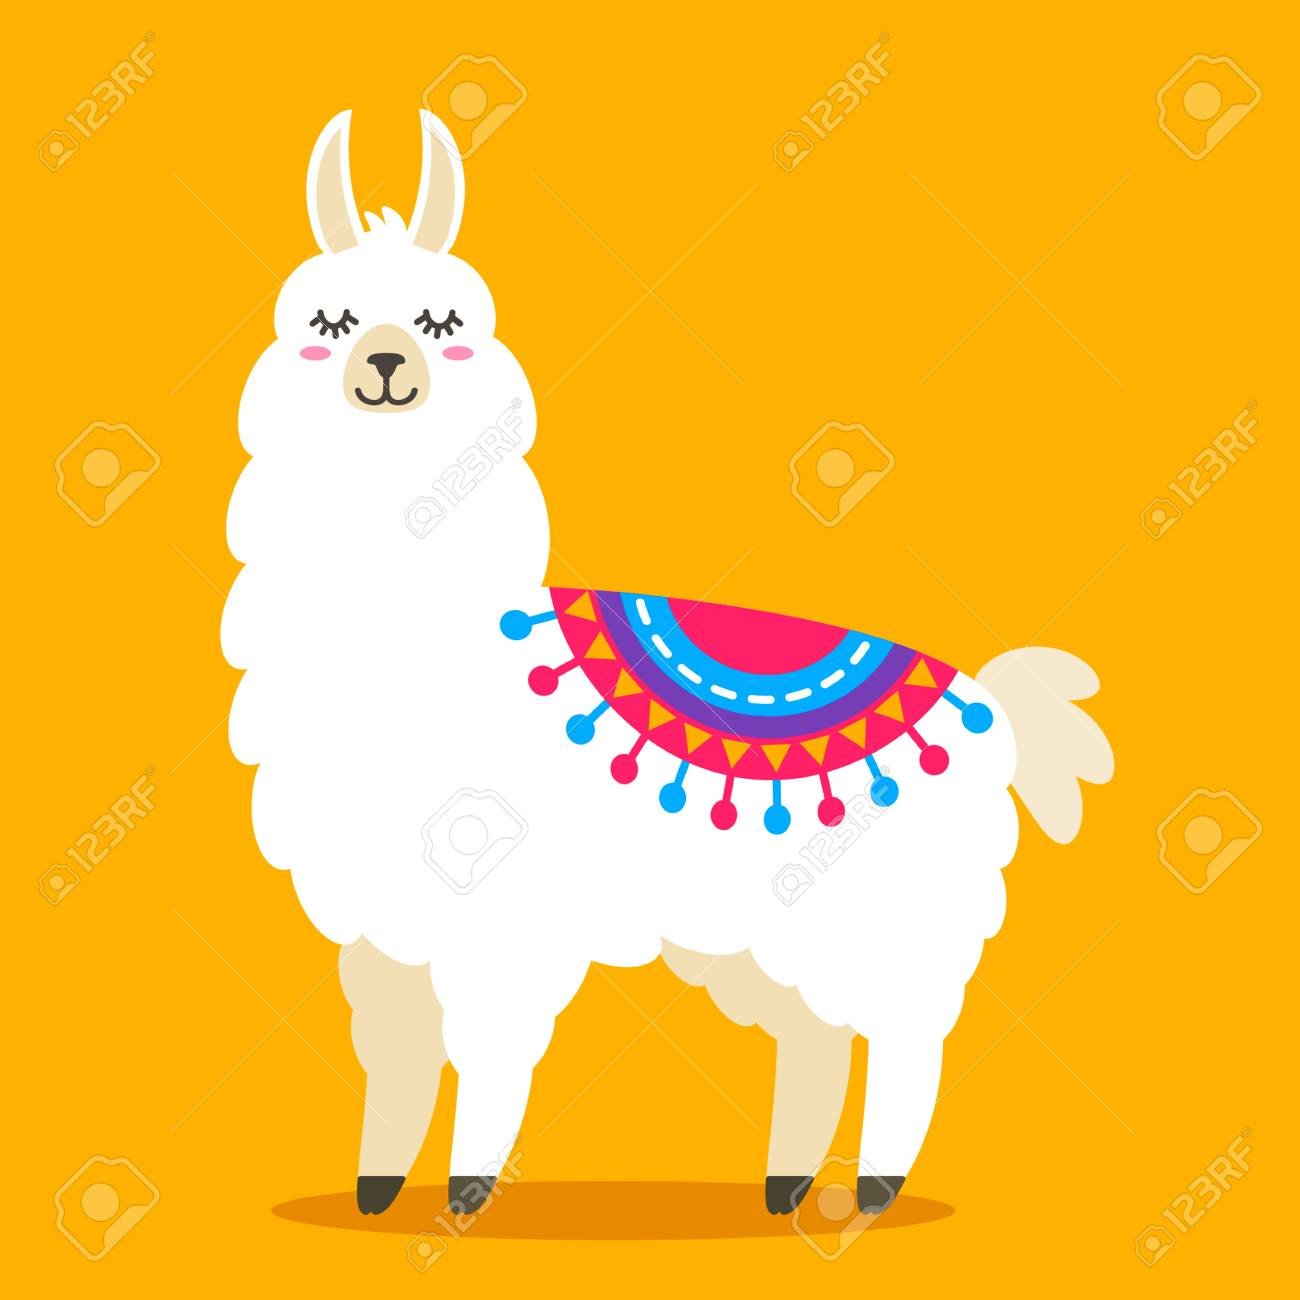 Funny Llama Alpaca In A Cartoon Style Isolated Flat Vector Illustration